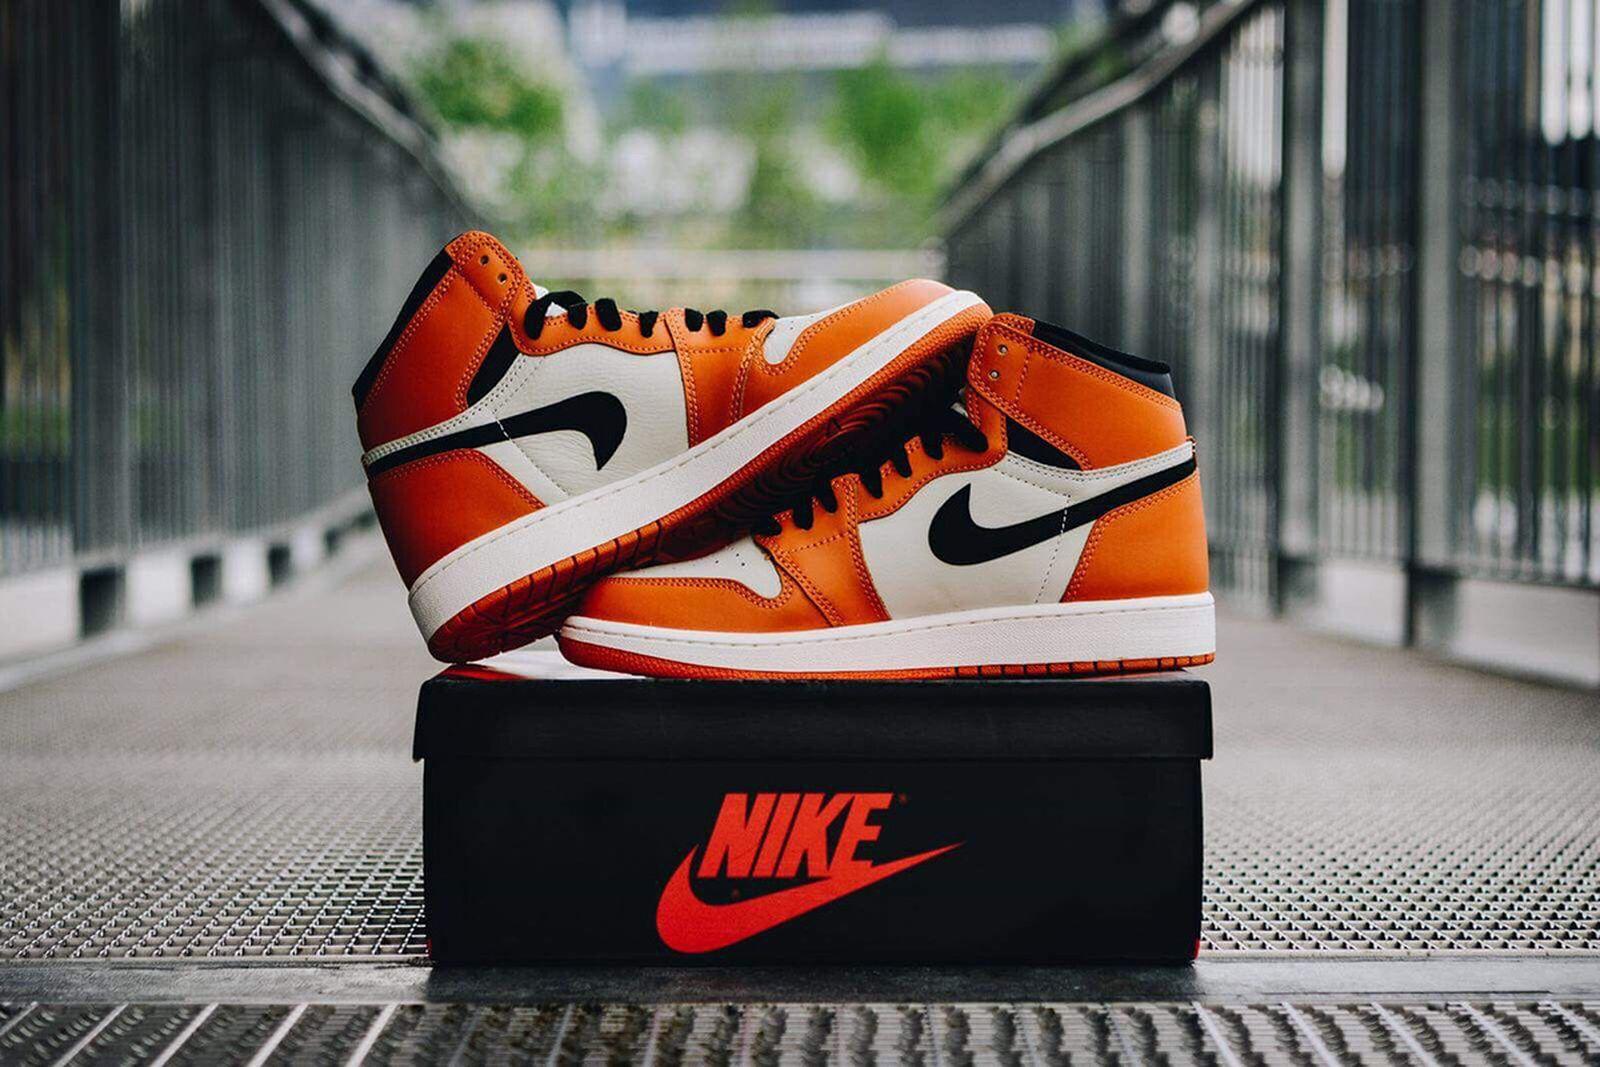 Sbb Shoes